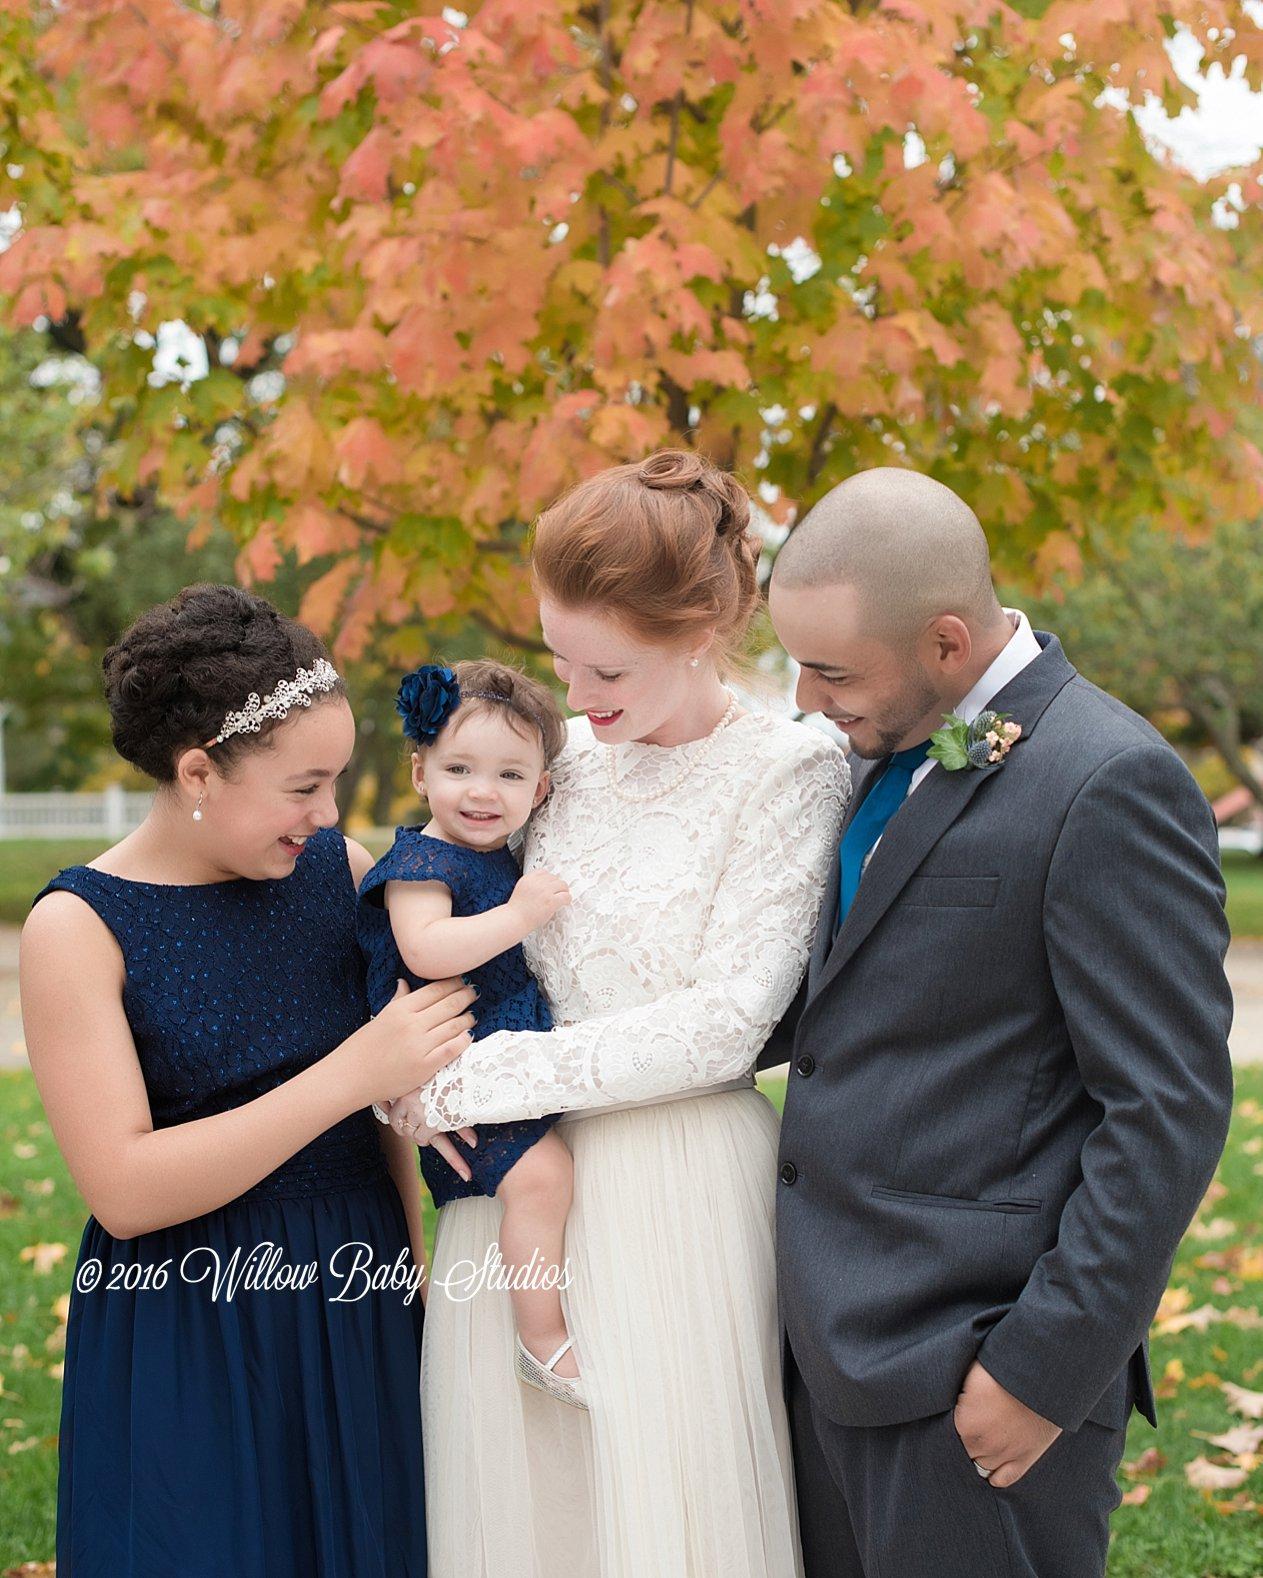 family of four celebrating their fall wedding